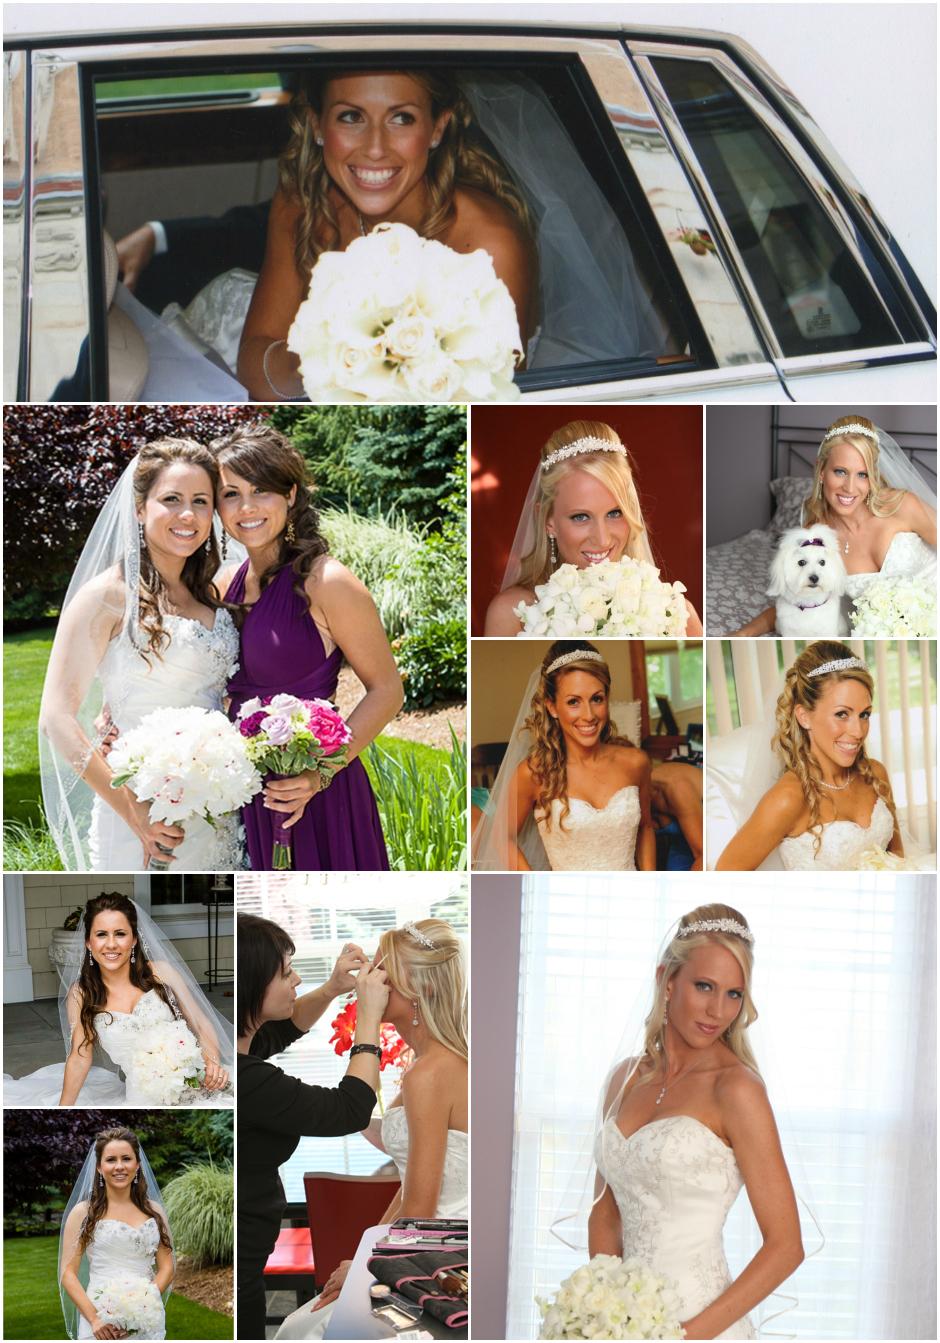 mirror-mirror-brides.jpg